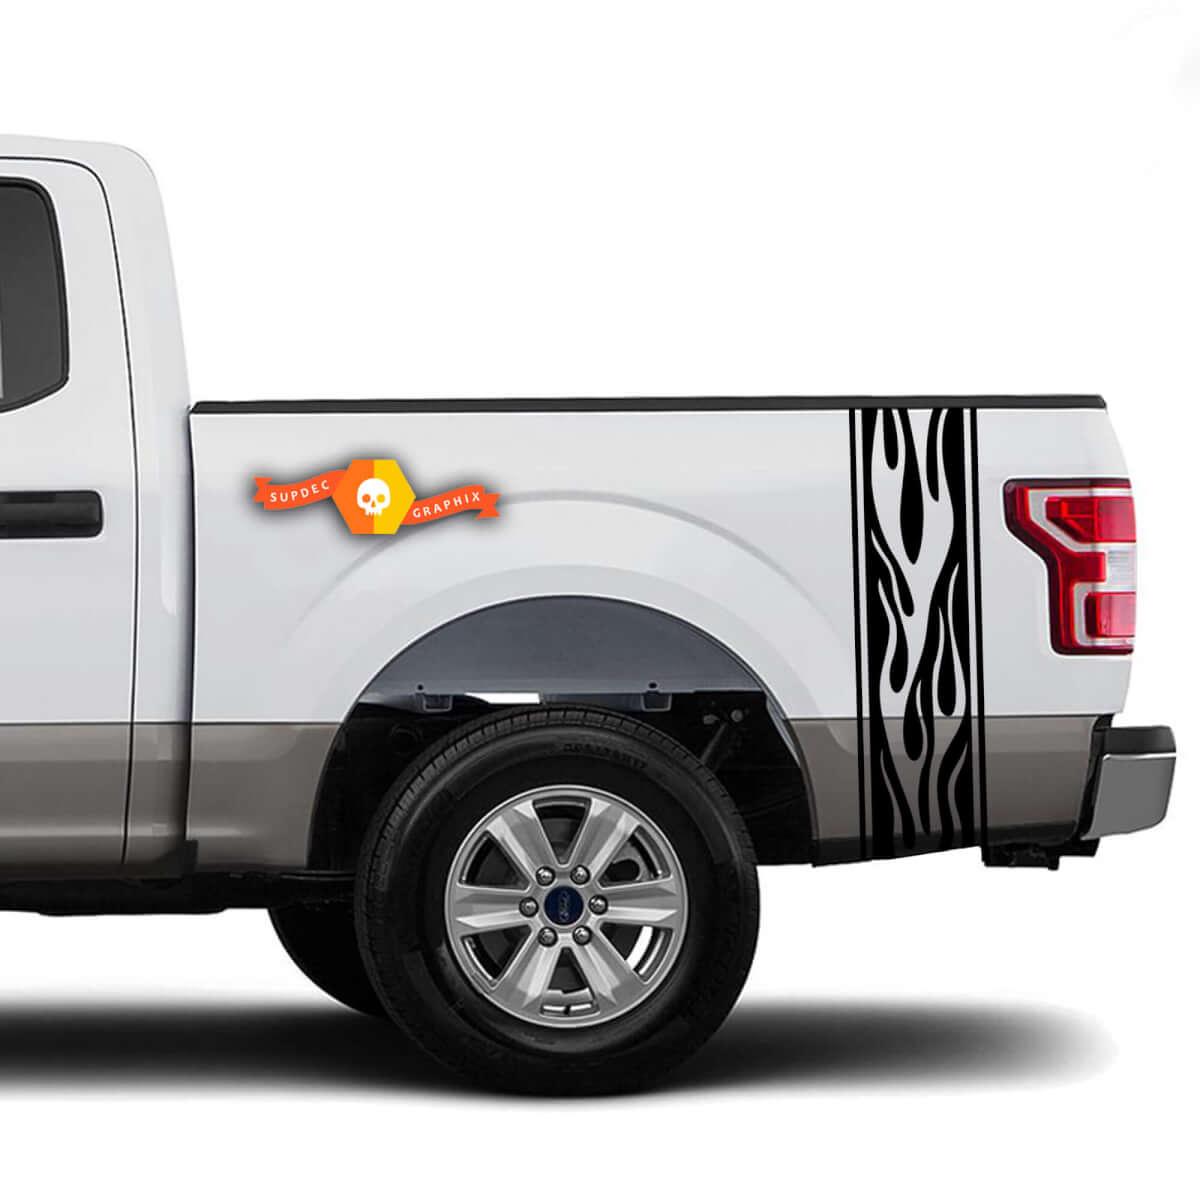 Flames Racer Bed Side Stripes Truck Aufkleber - Passend für Ram Chevy Ford Jeep Gladiator